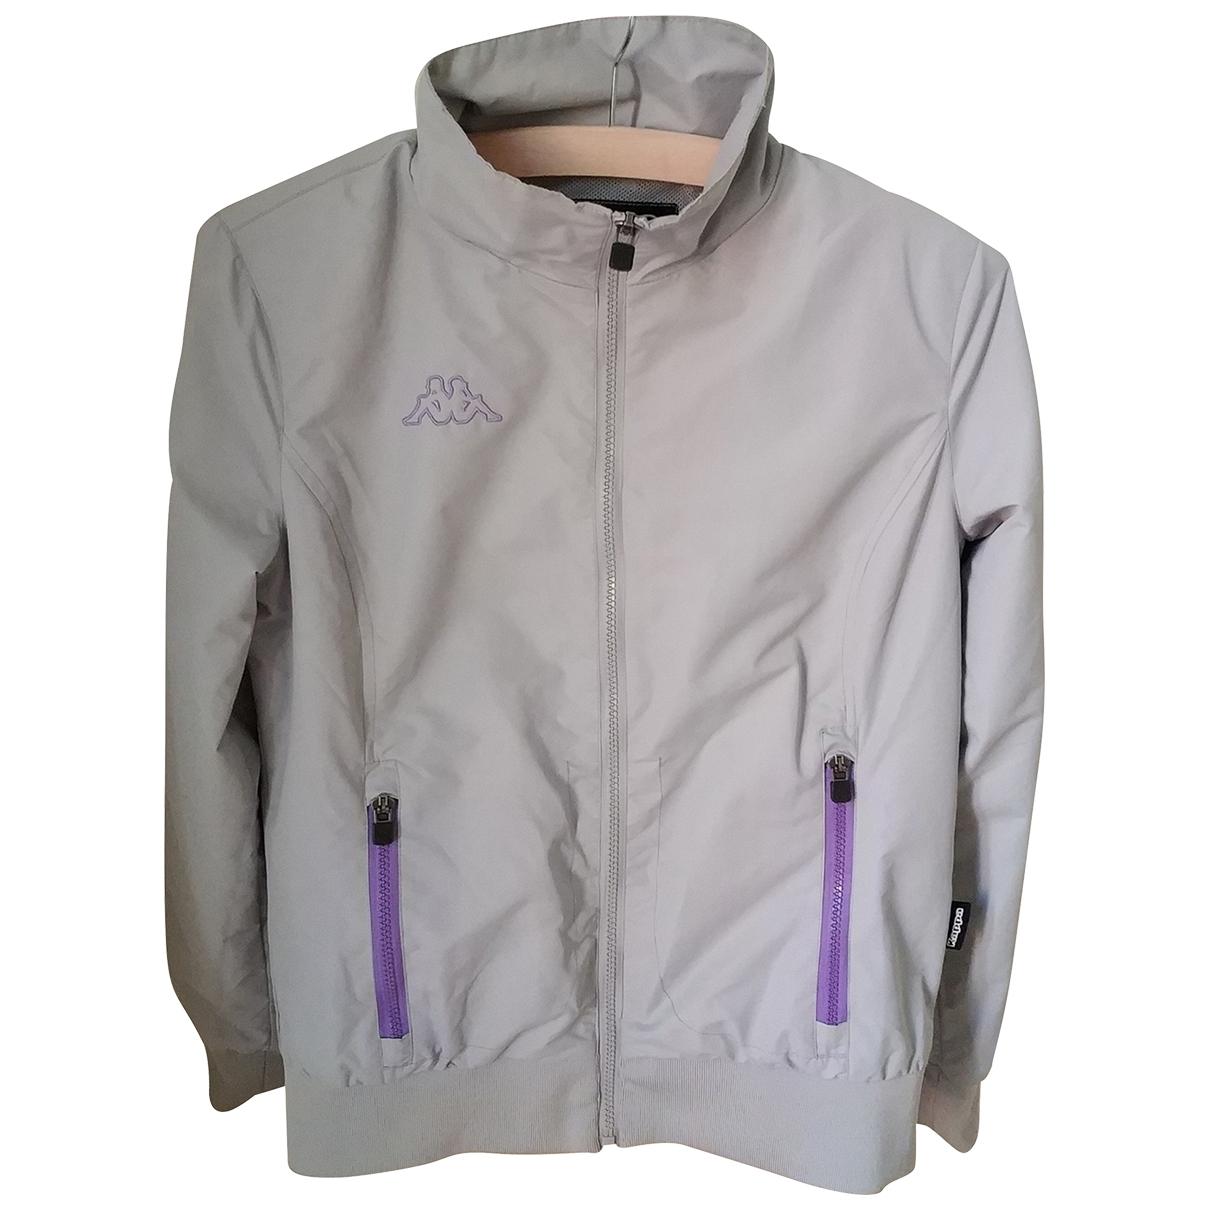 Kappa \N Grey jacket for Women S International